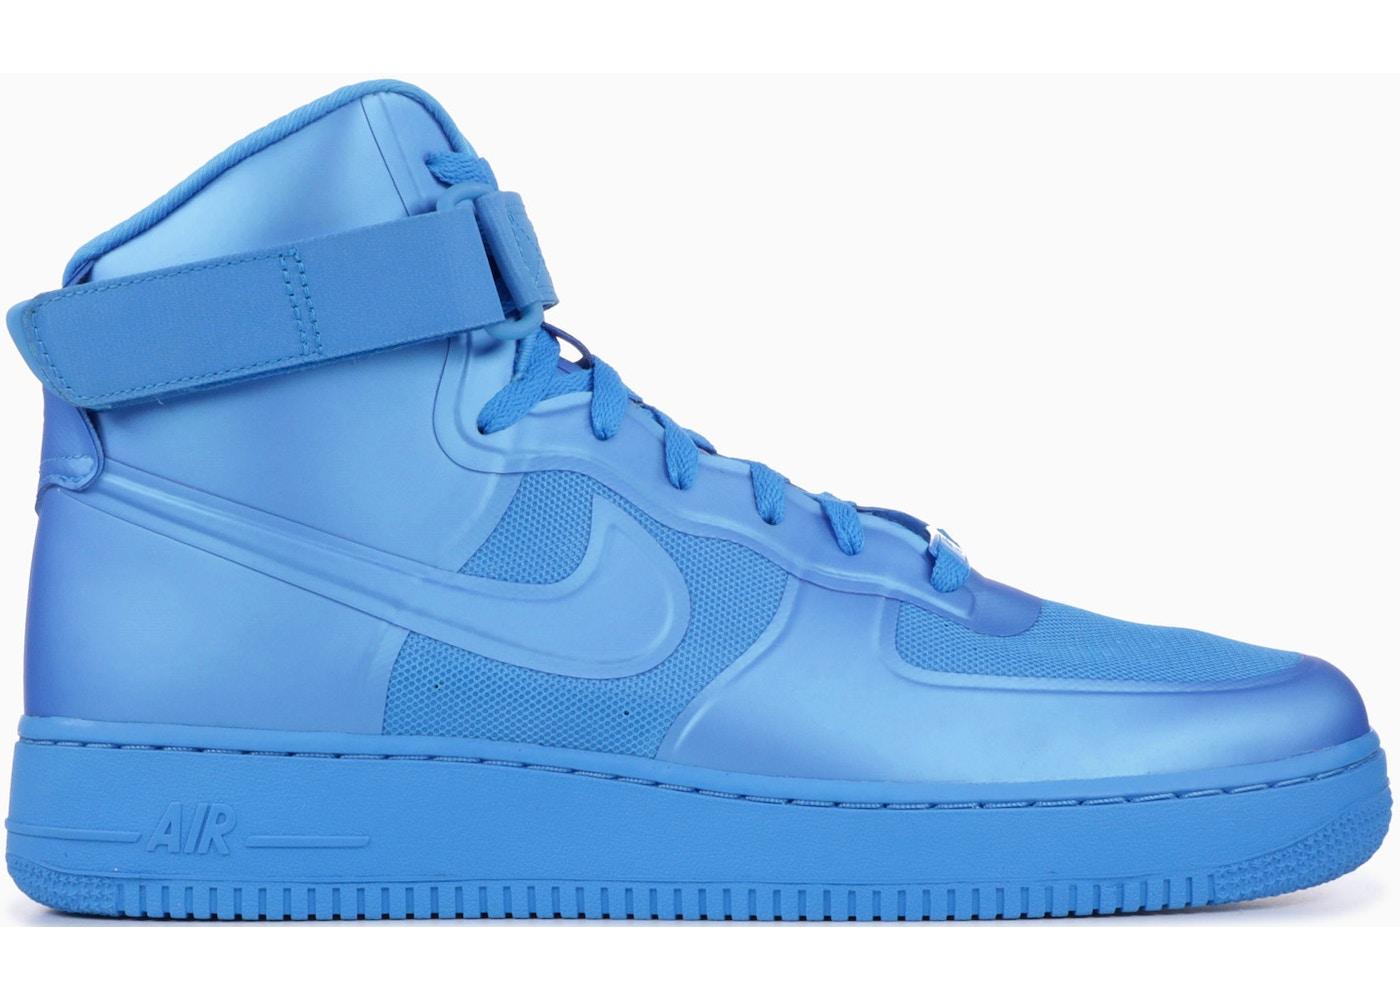 Nike Air Force 1 High Hyperfuse